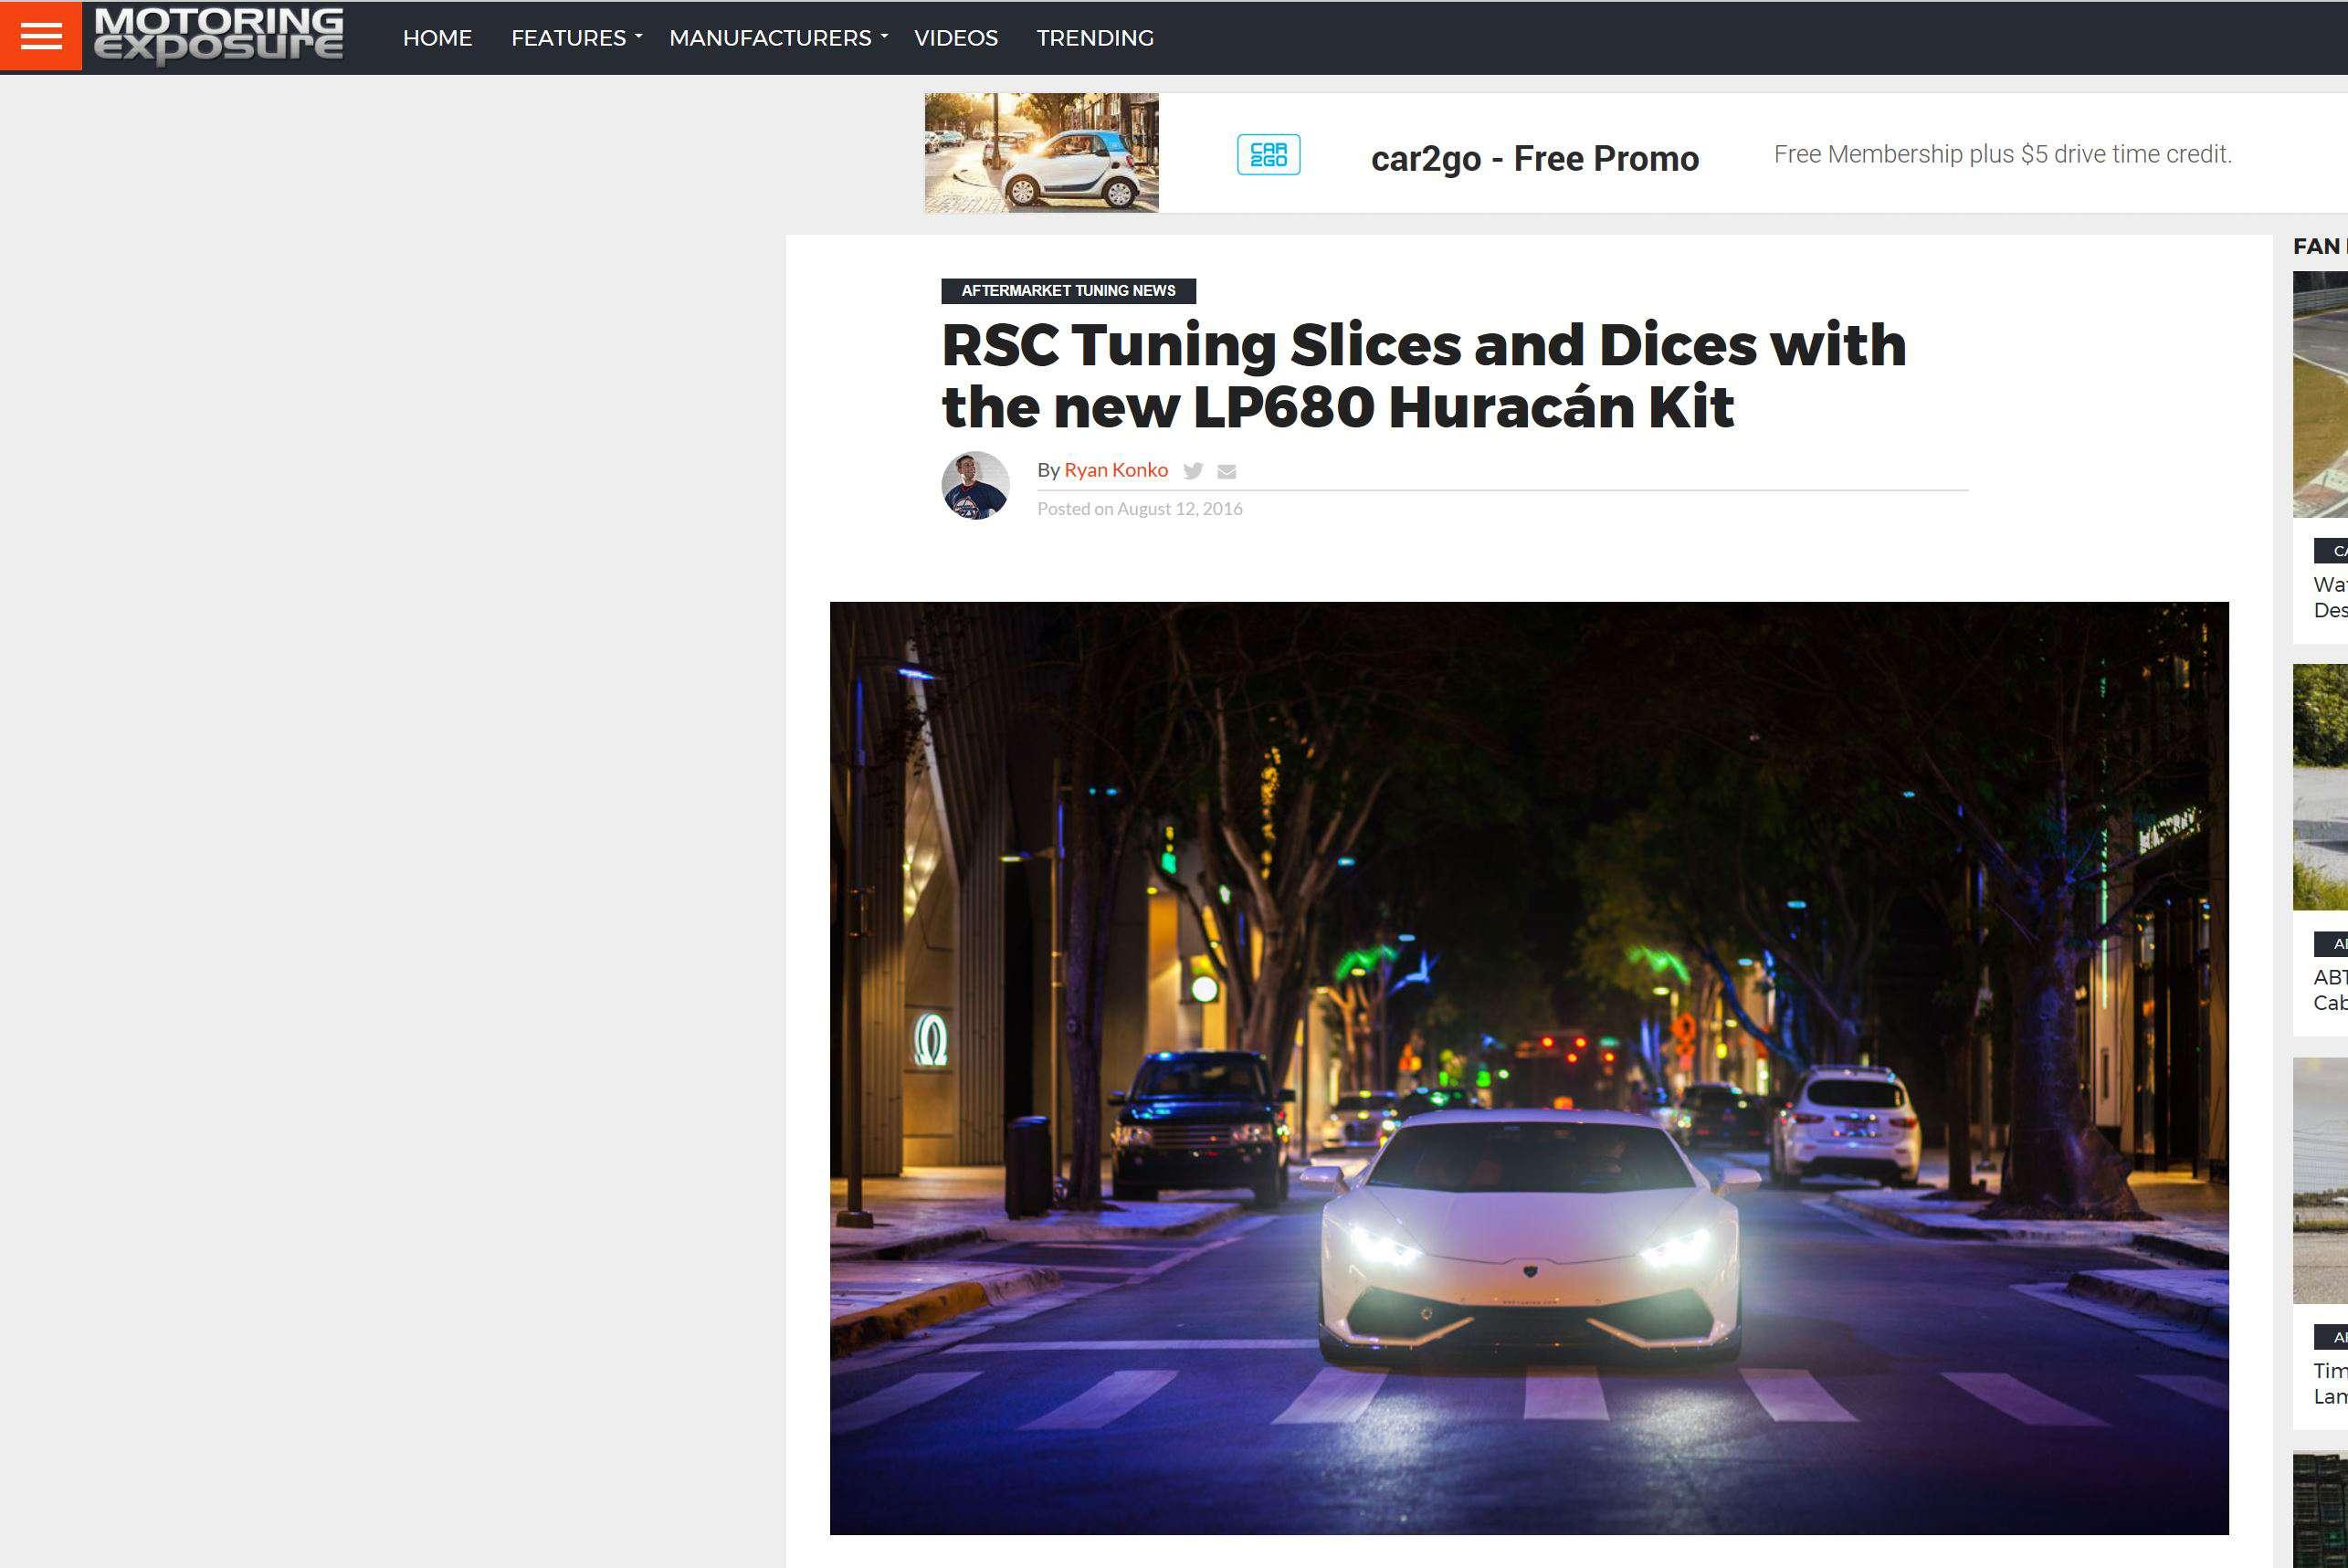 Motoring Exposure Covers RSC Huracan Kit Launch